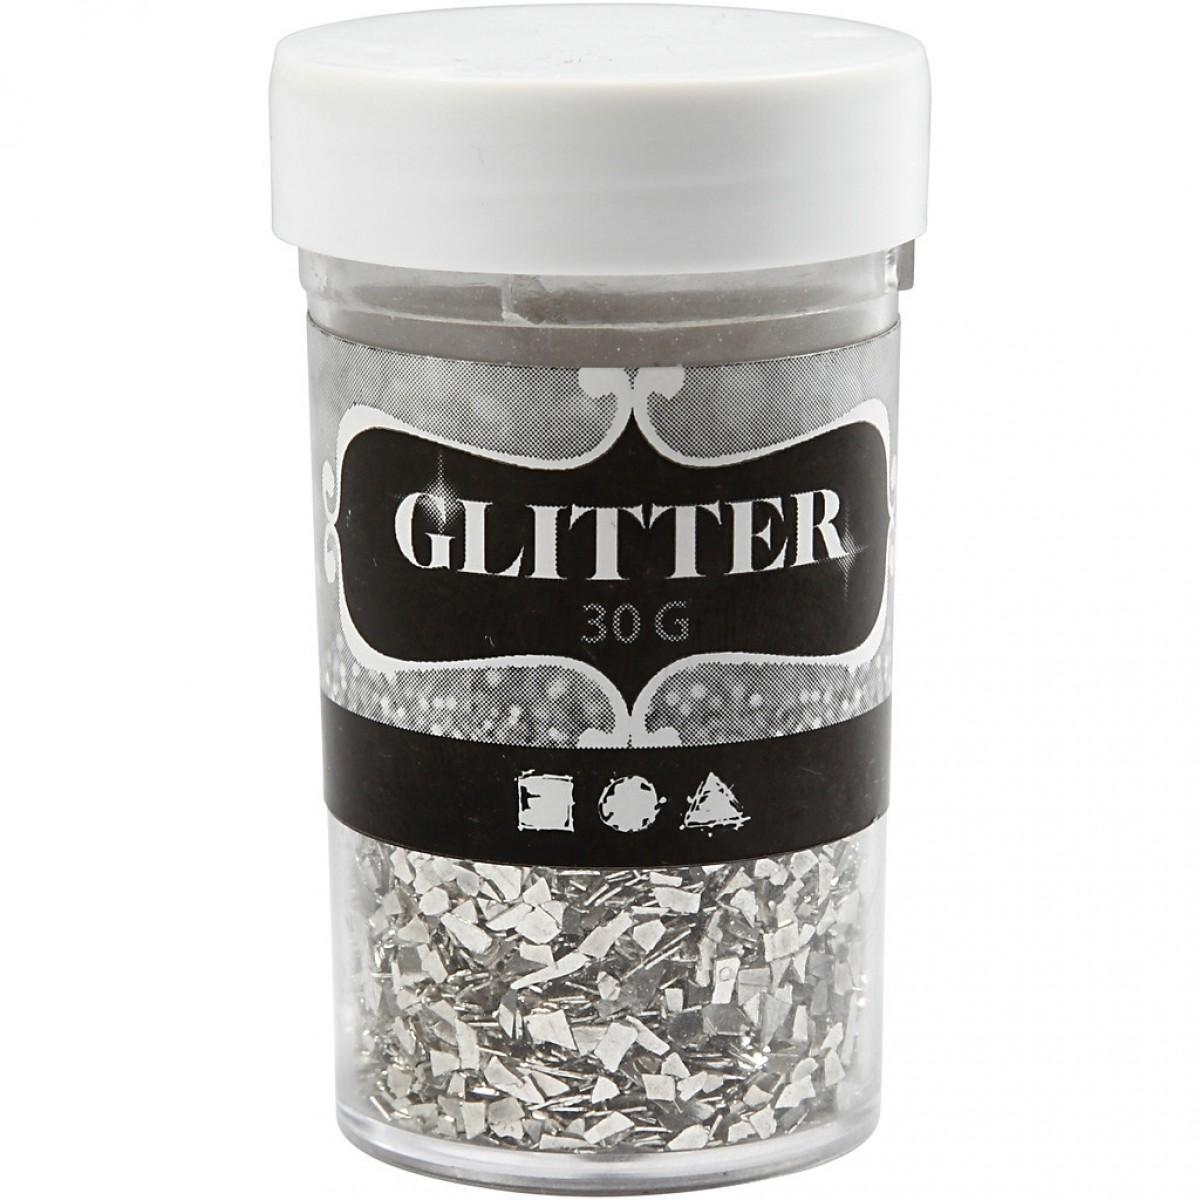 GlitterGrov30g-01